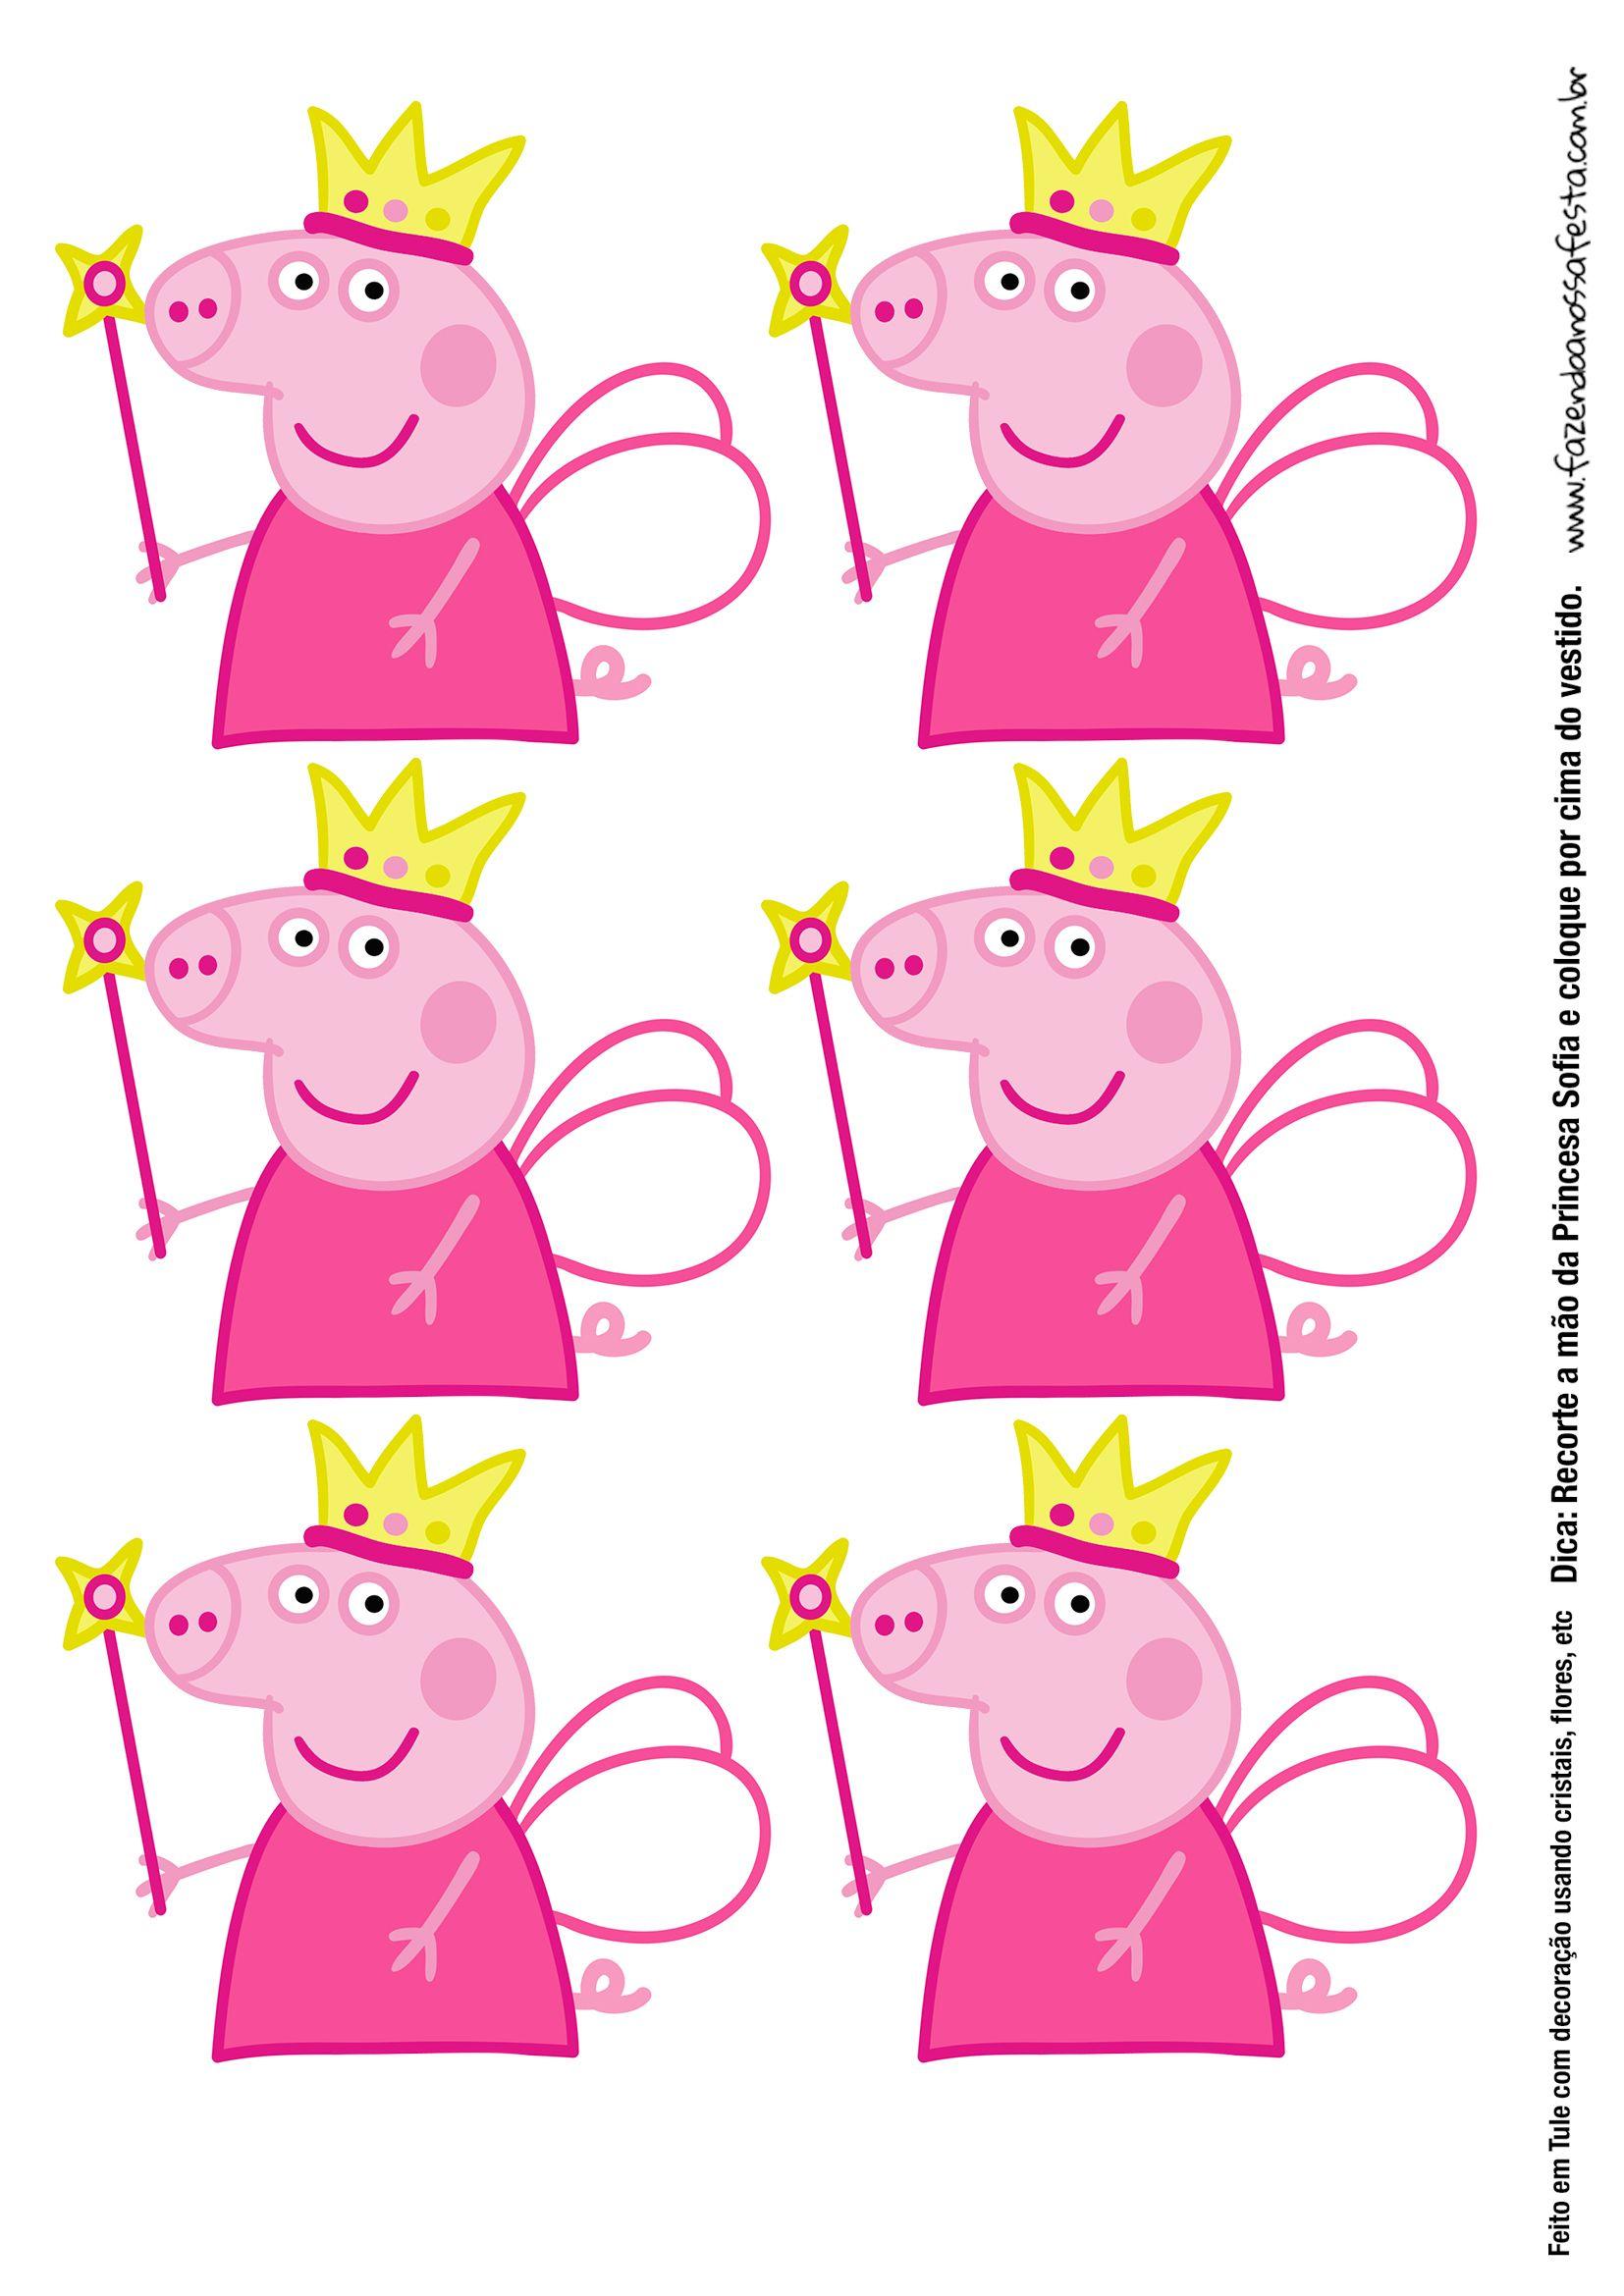 Pe peppa pig coloring pictures to print - Molde Peppa Pig Princesa Para Tubete Com Tule